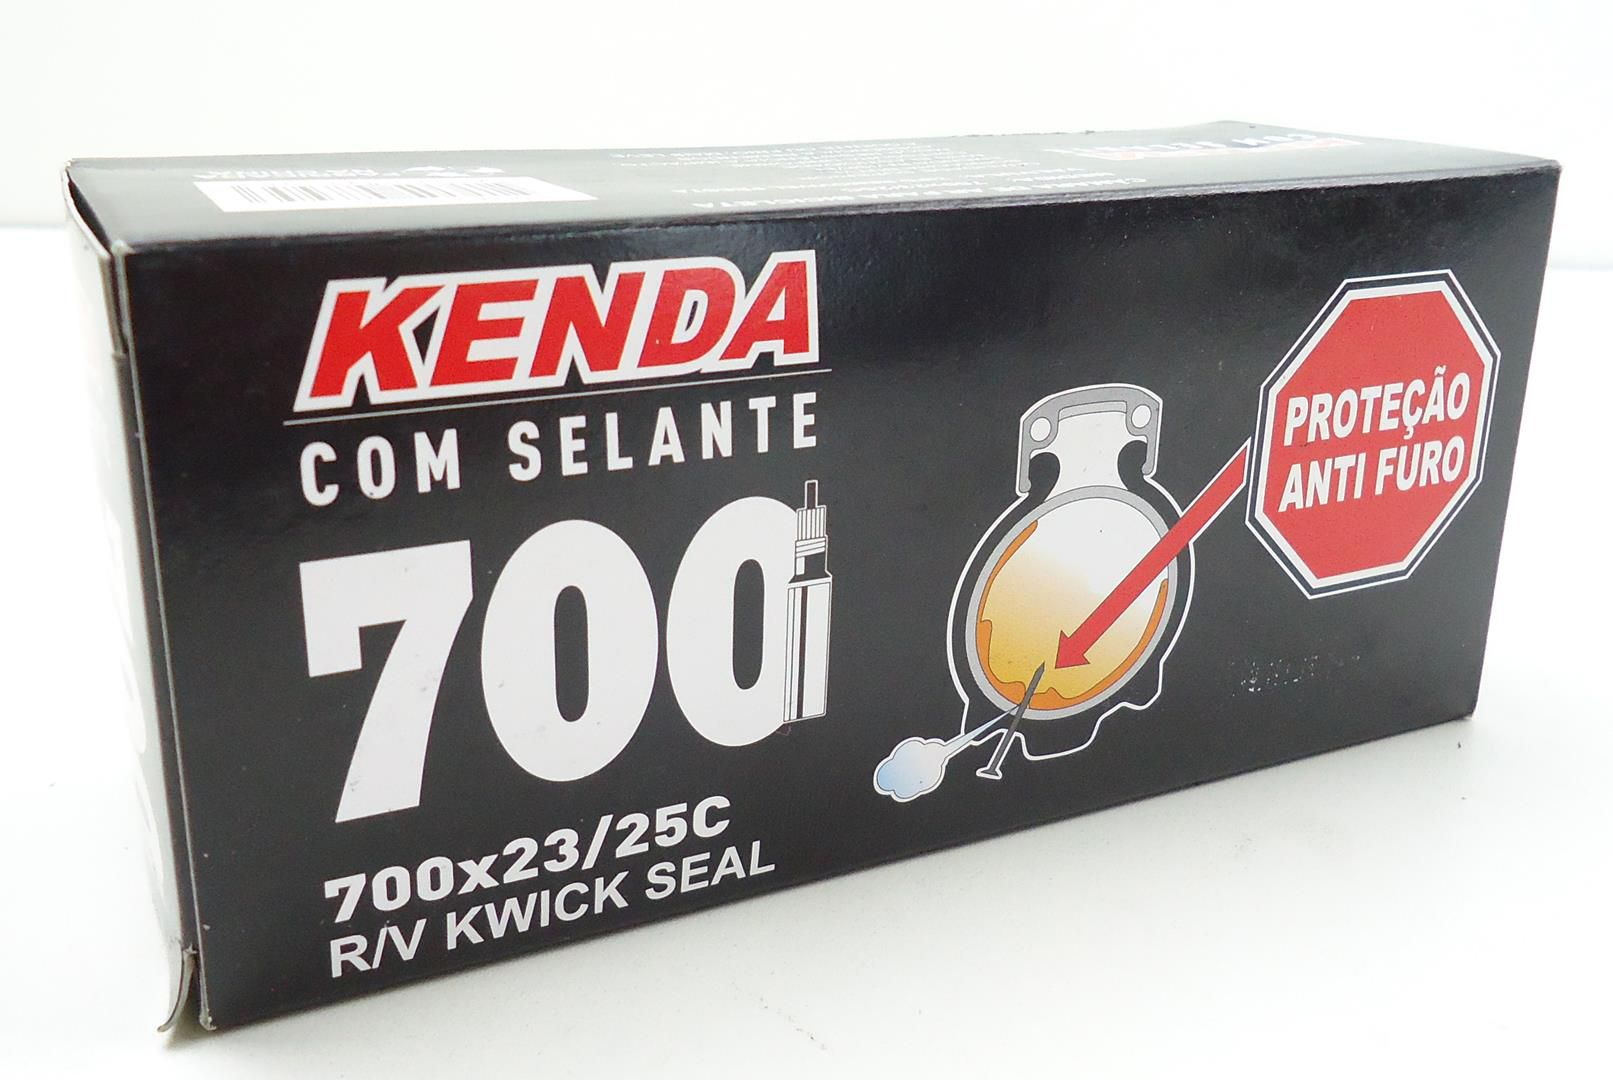 Câmara De Ar com Selante Bicicleta Speed Kenda Aro 700 x 23/25mm Válvula Presta Bico Fino Anti-Furo